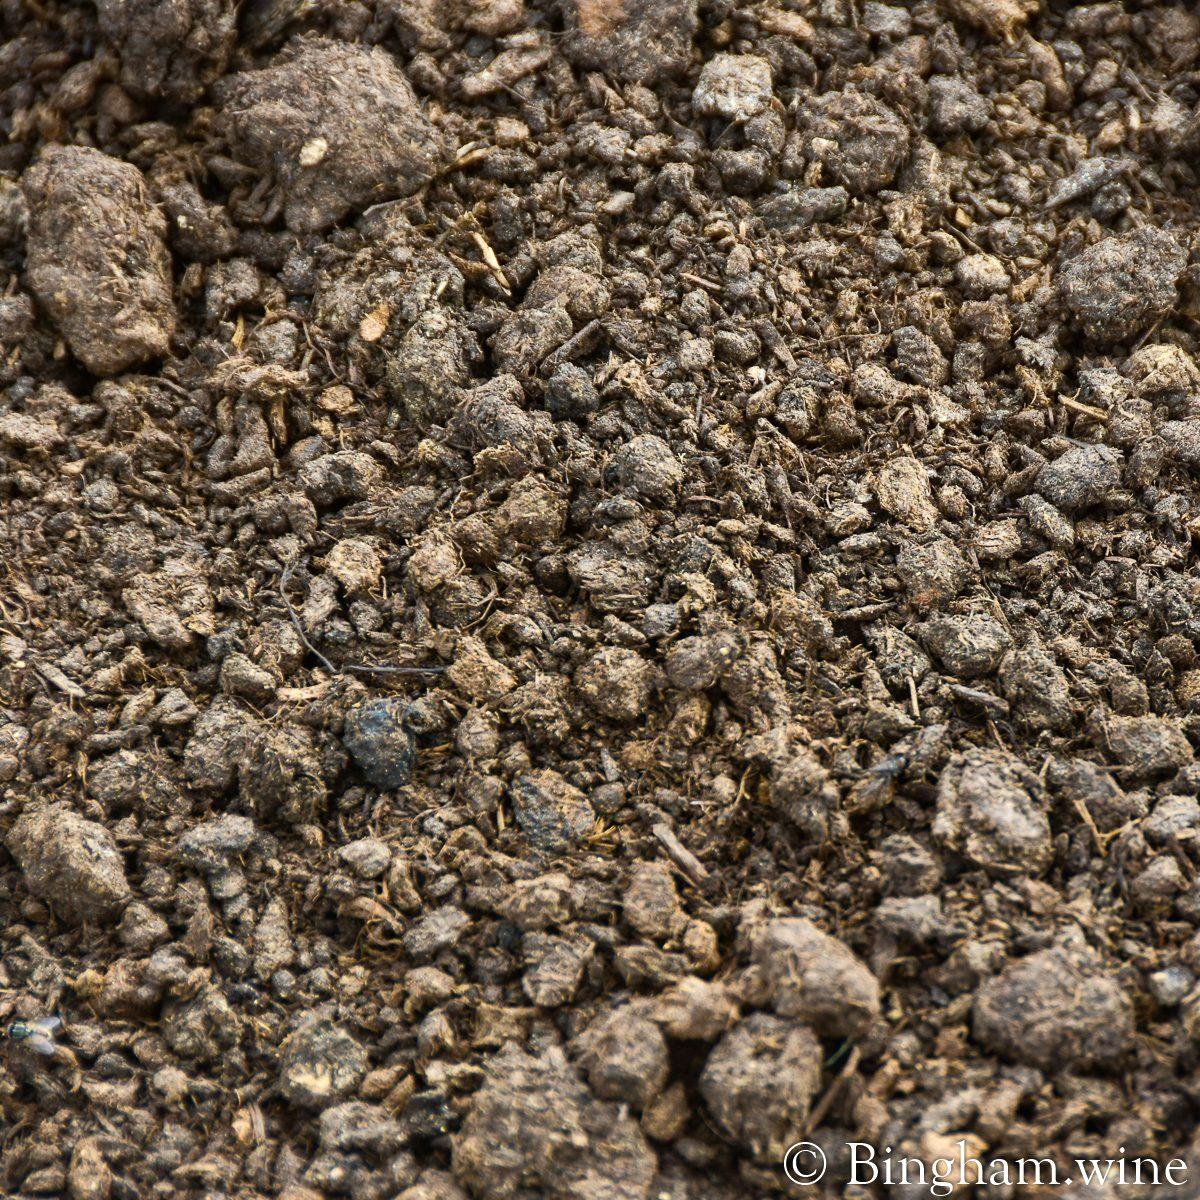 Close up photo of compost at Bingham Organic Farms.